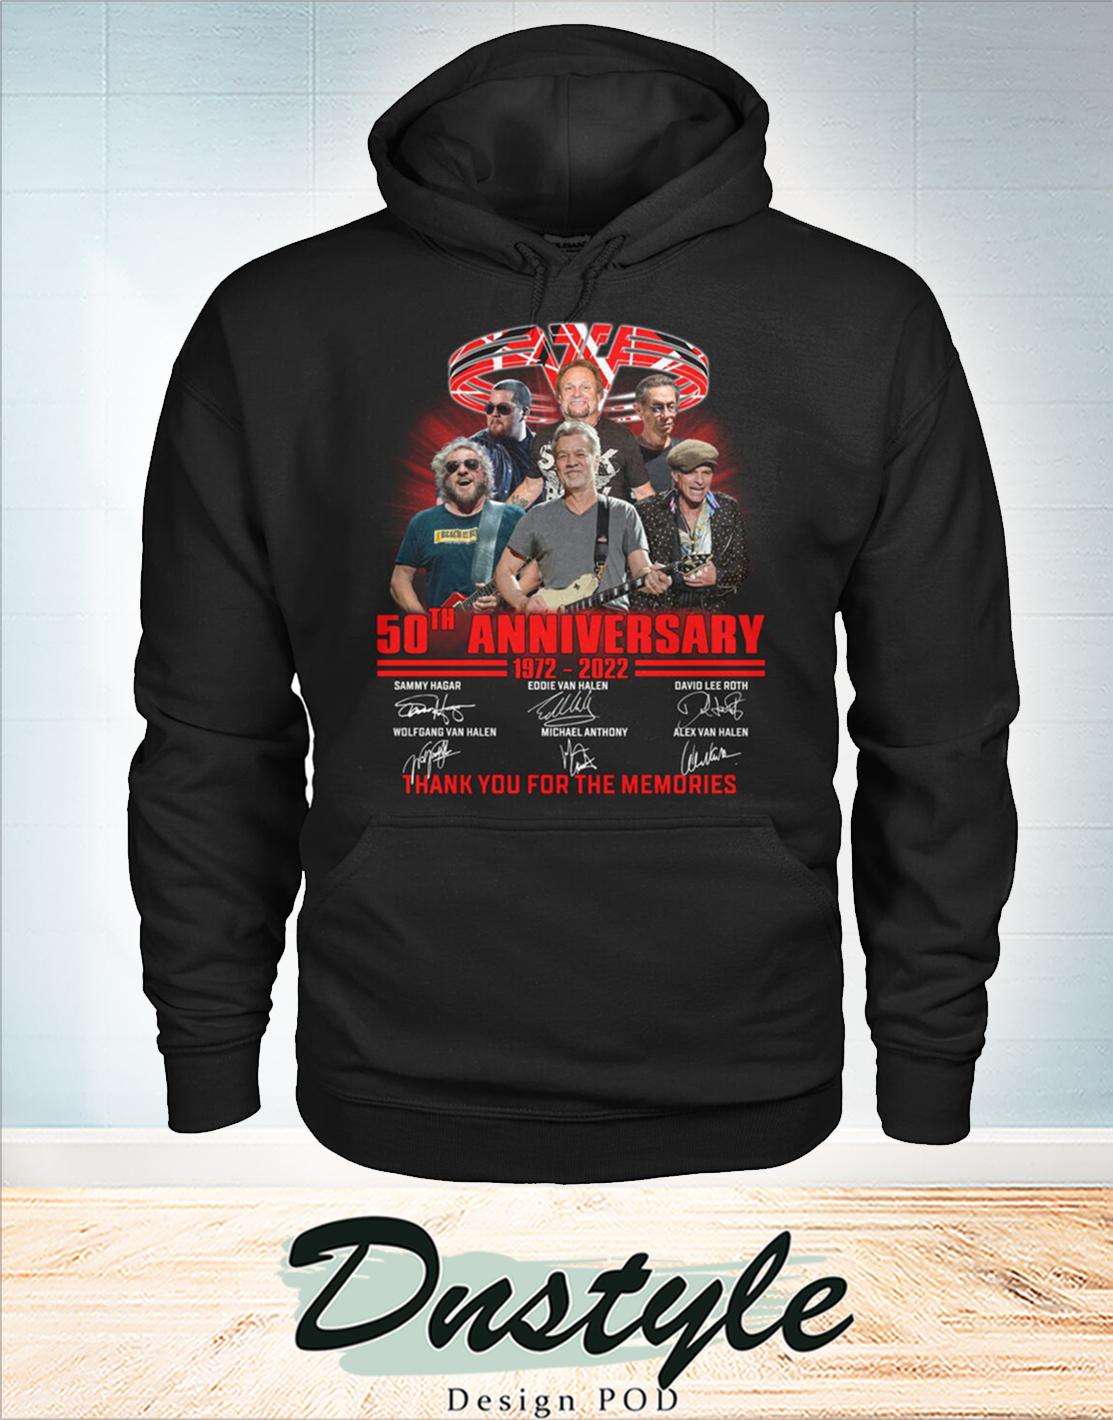 Van Halen 50th 1972 2022 anniversary thanks you for the memories hoodie